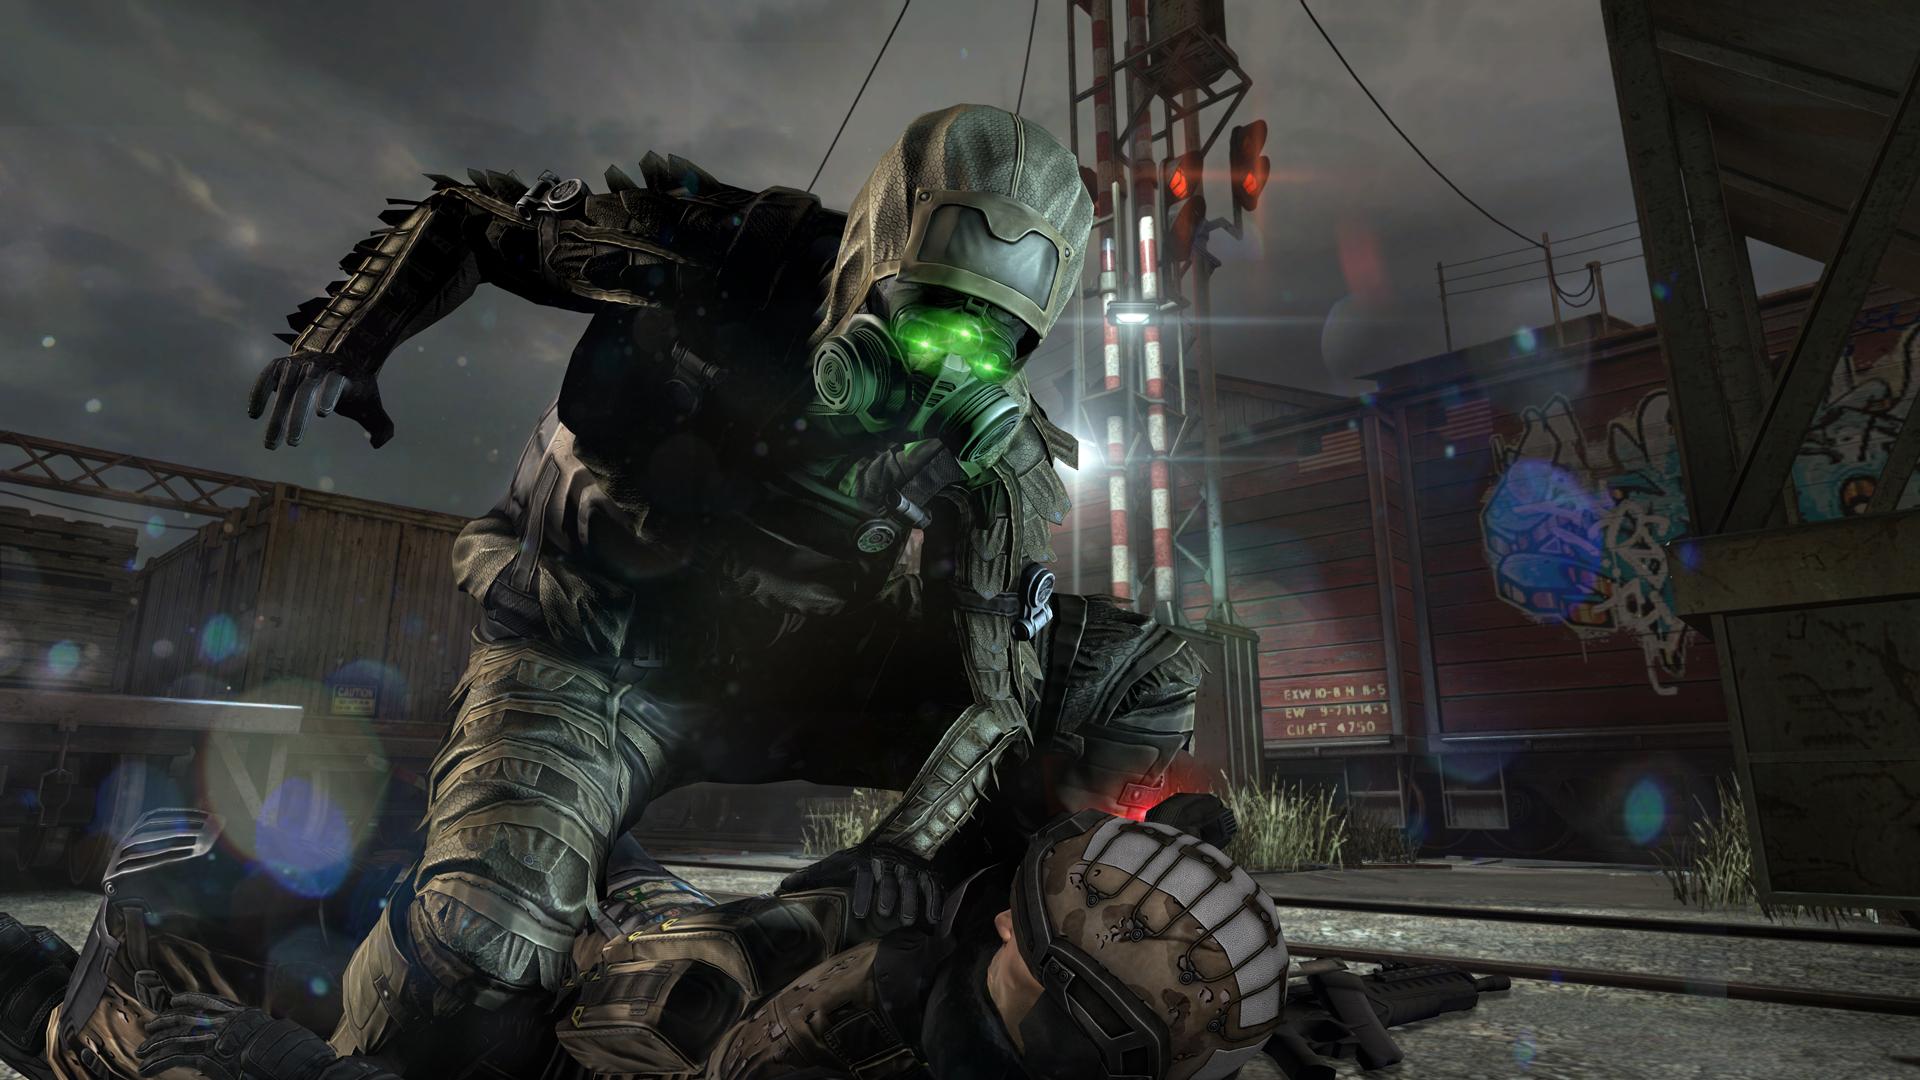 Tom Clancy's Splinter Cell, Ubisoft